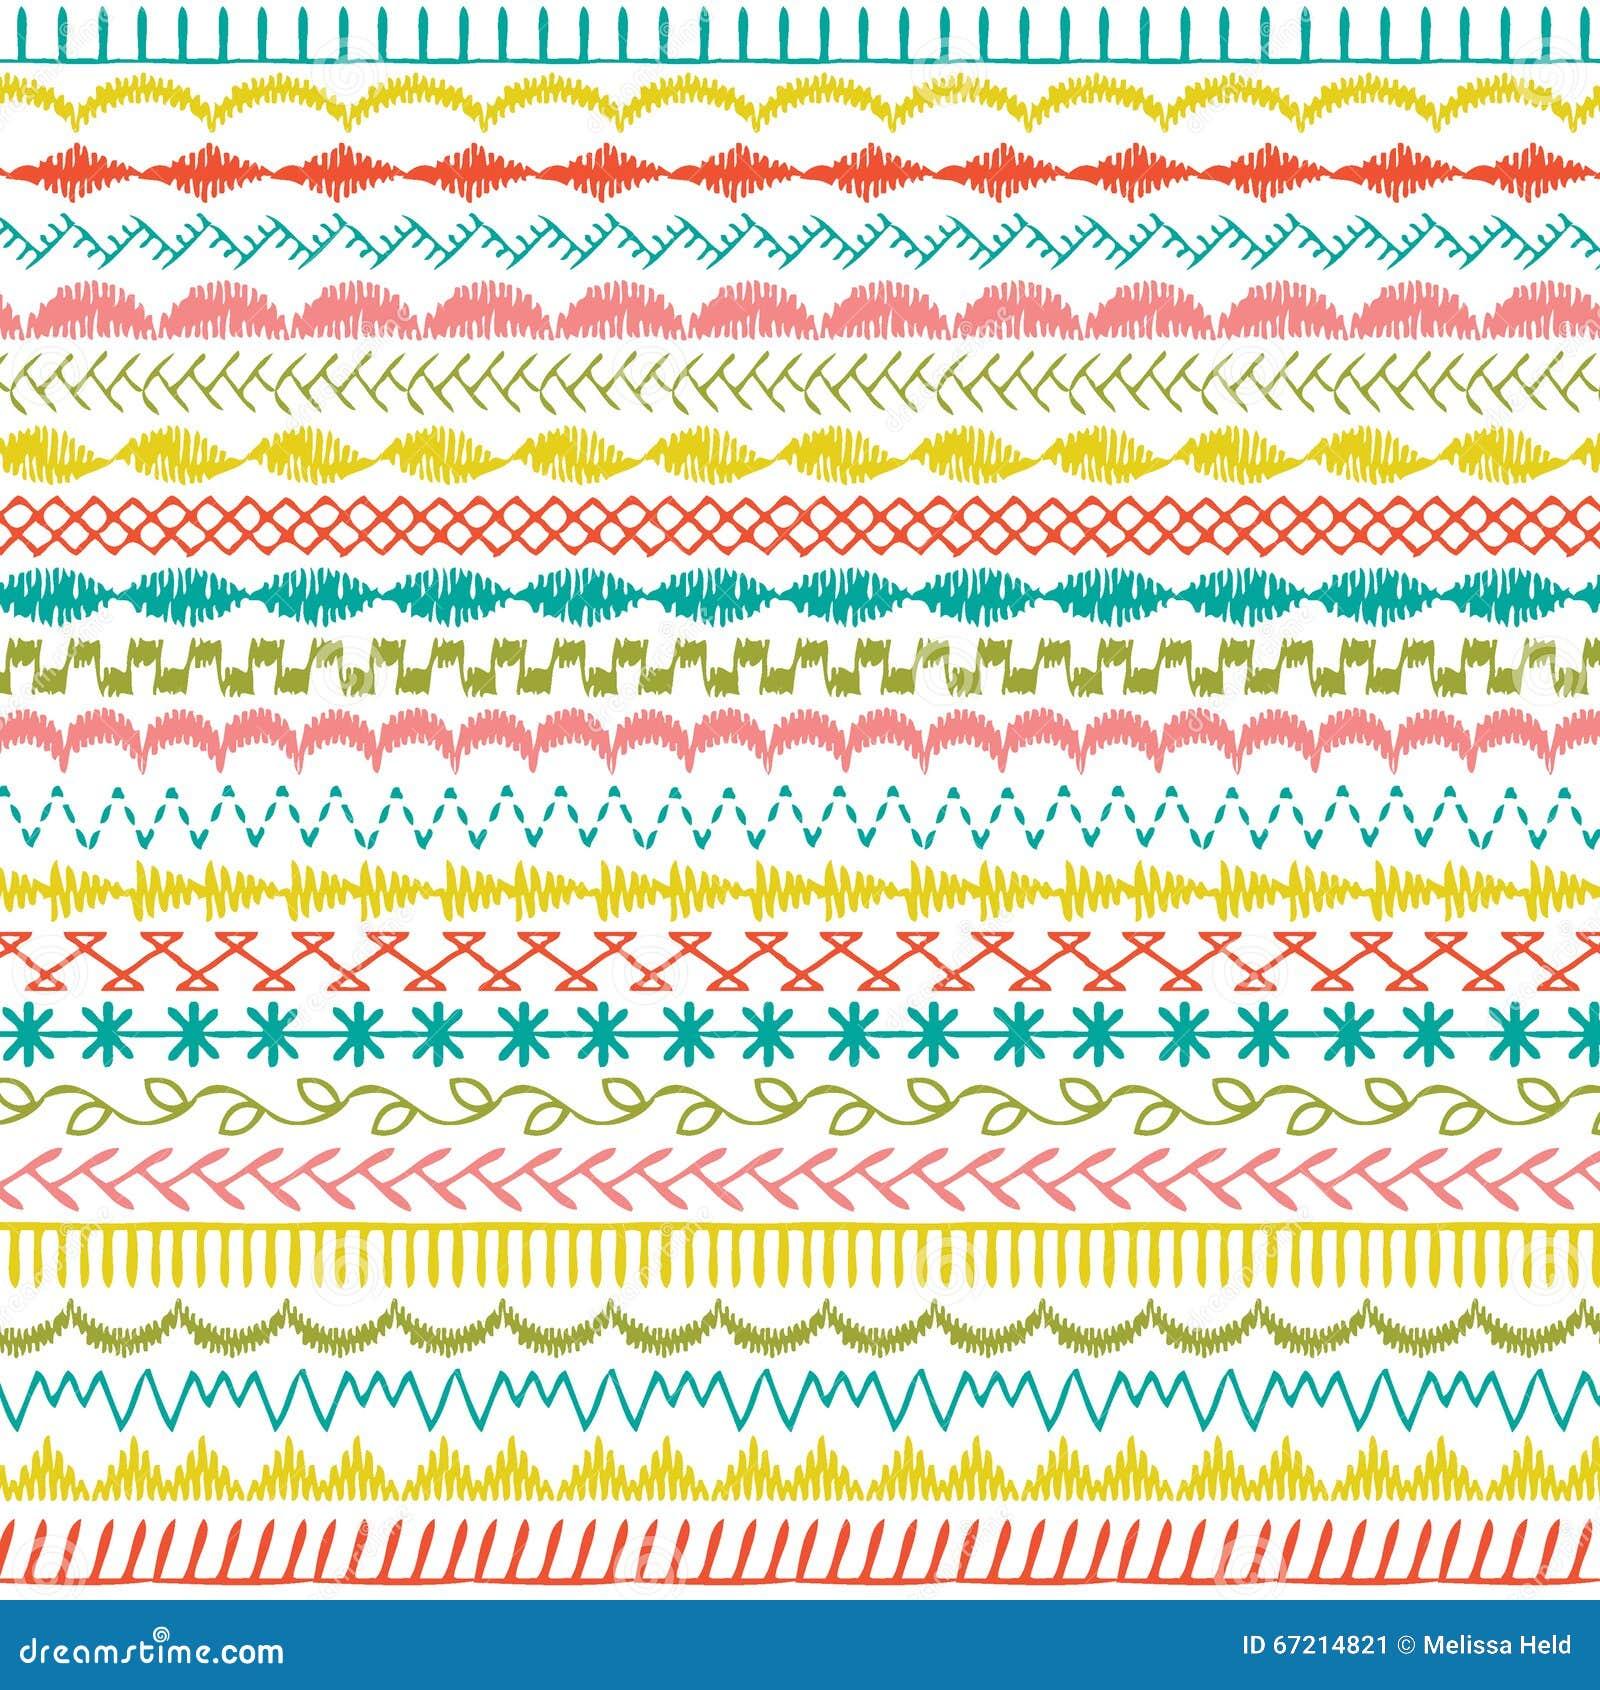 Sewing stitch borders stock illustration image